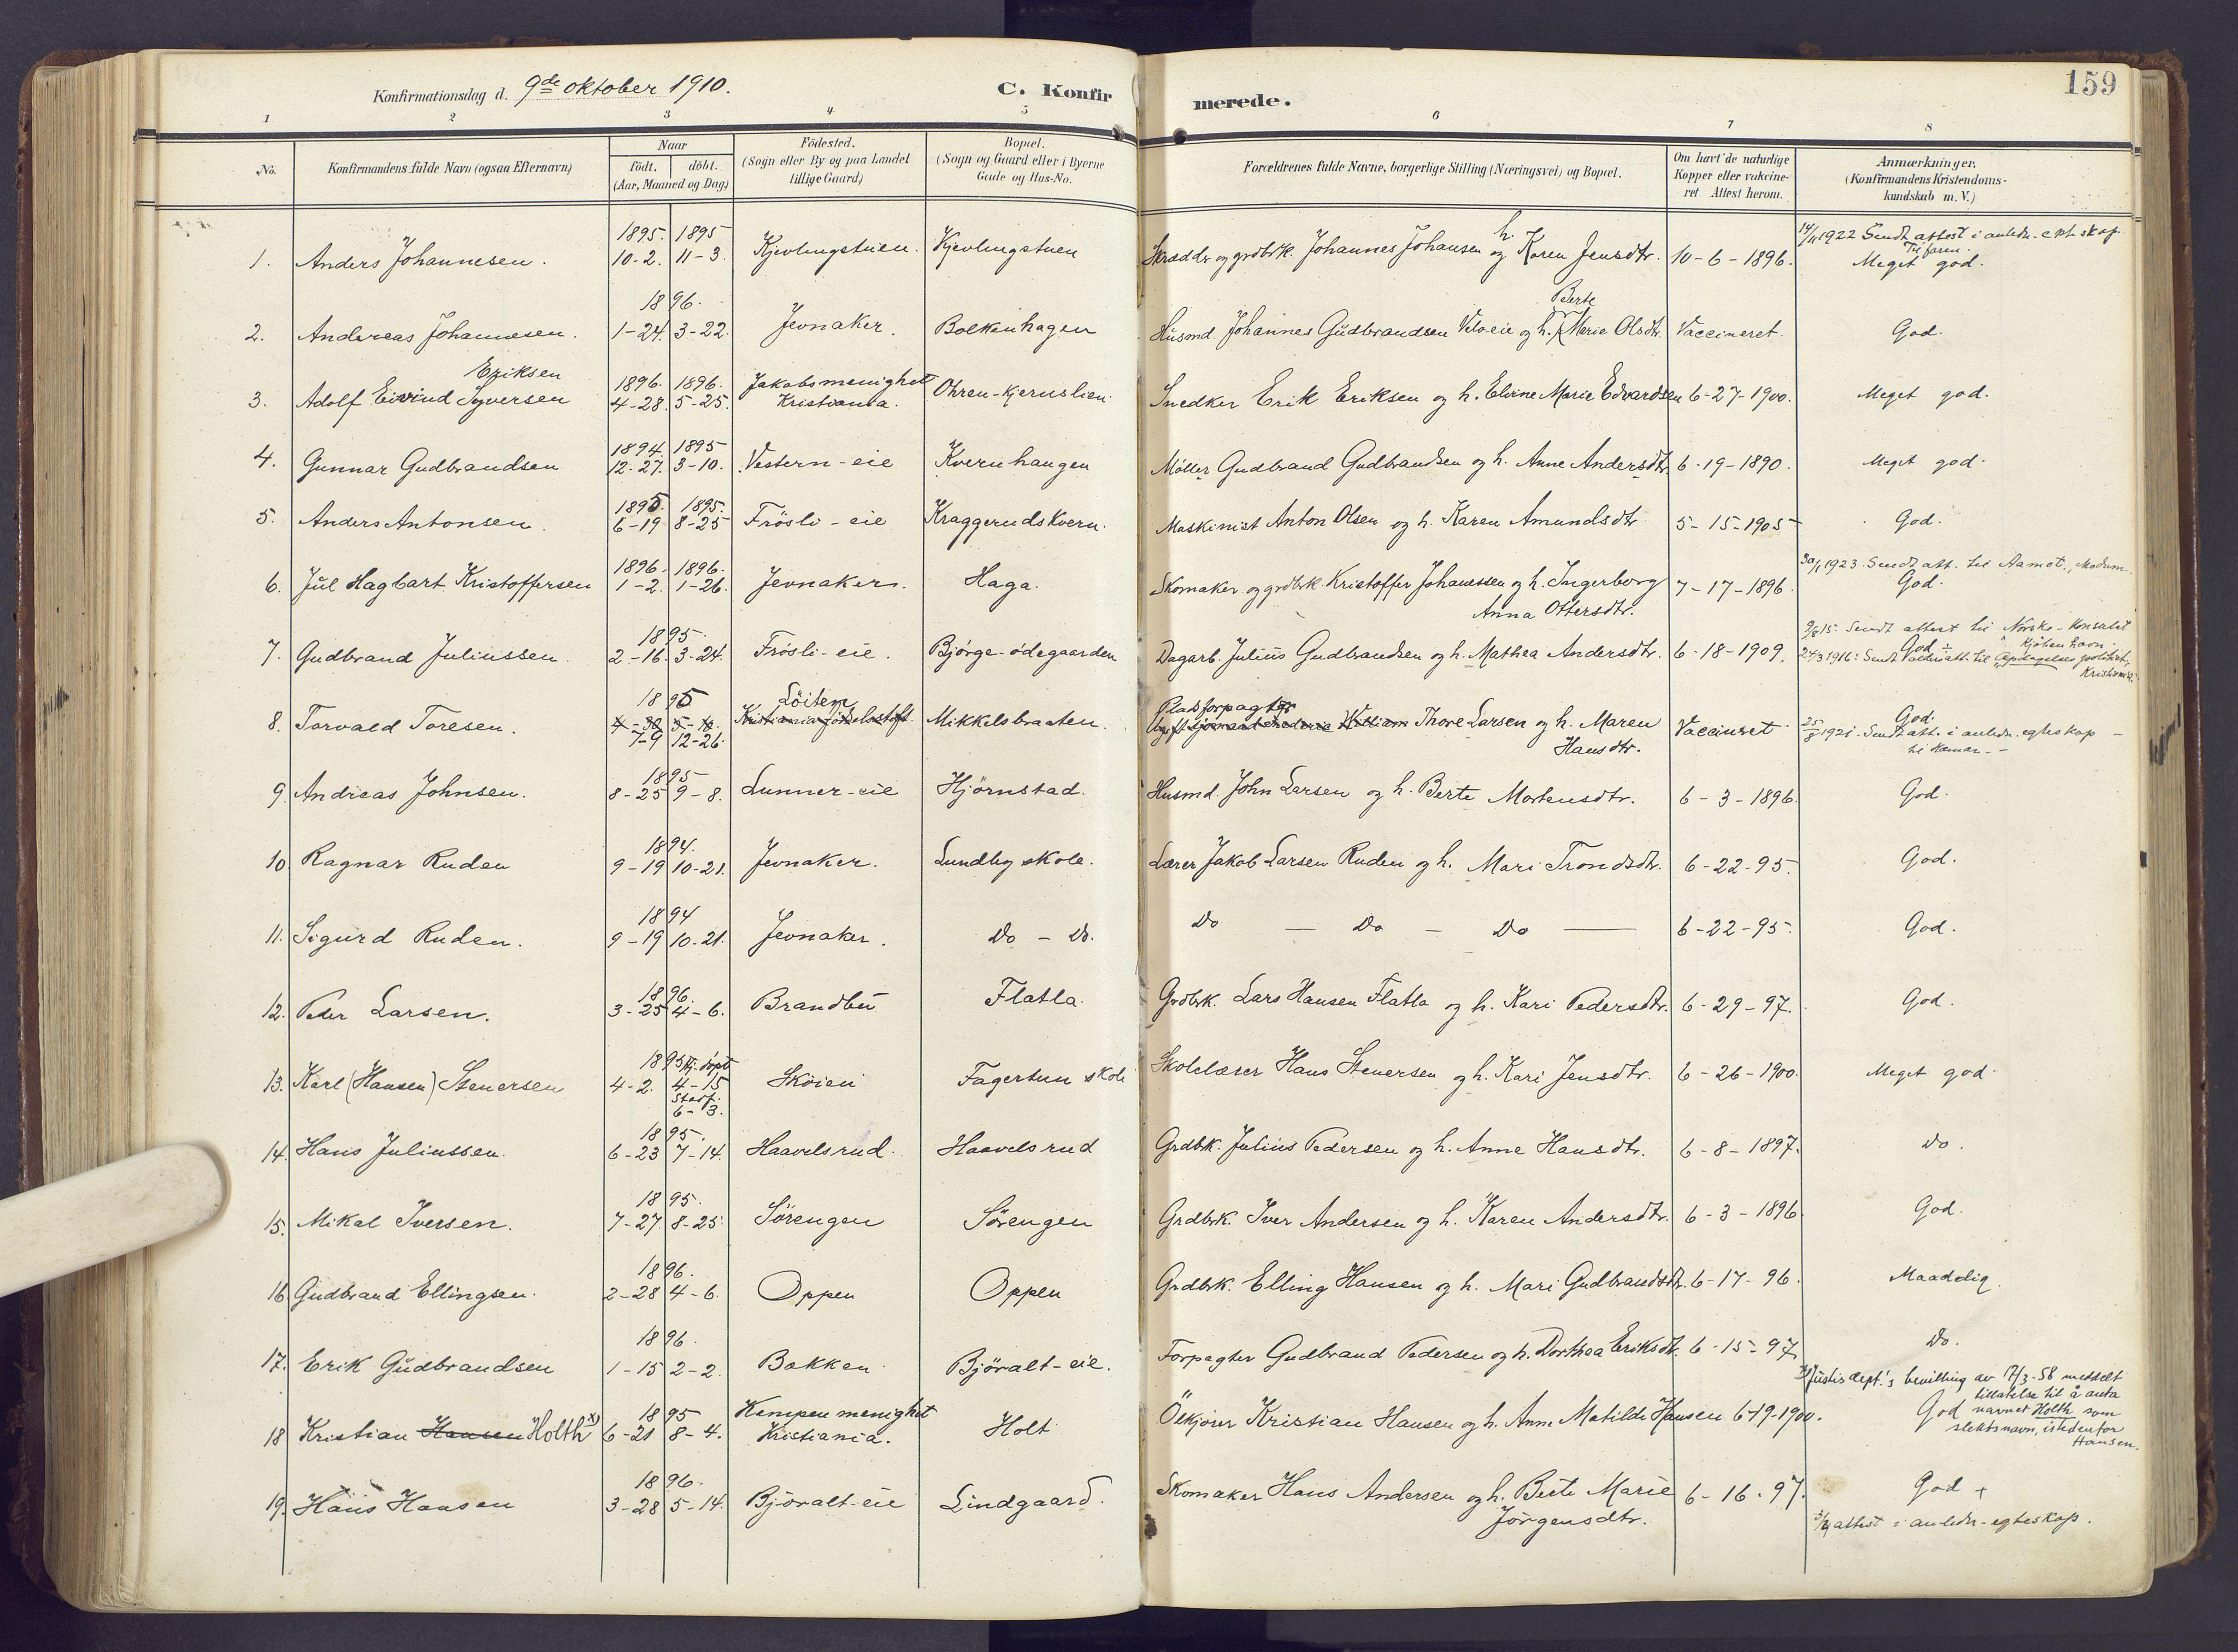 SAH, Lunner prestekontor, H/Ha/Haa/L0001: Ministerialbok nr. 1, 1907-1922, s. 159